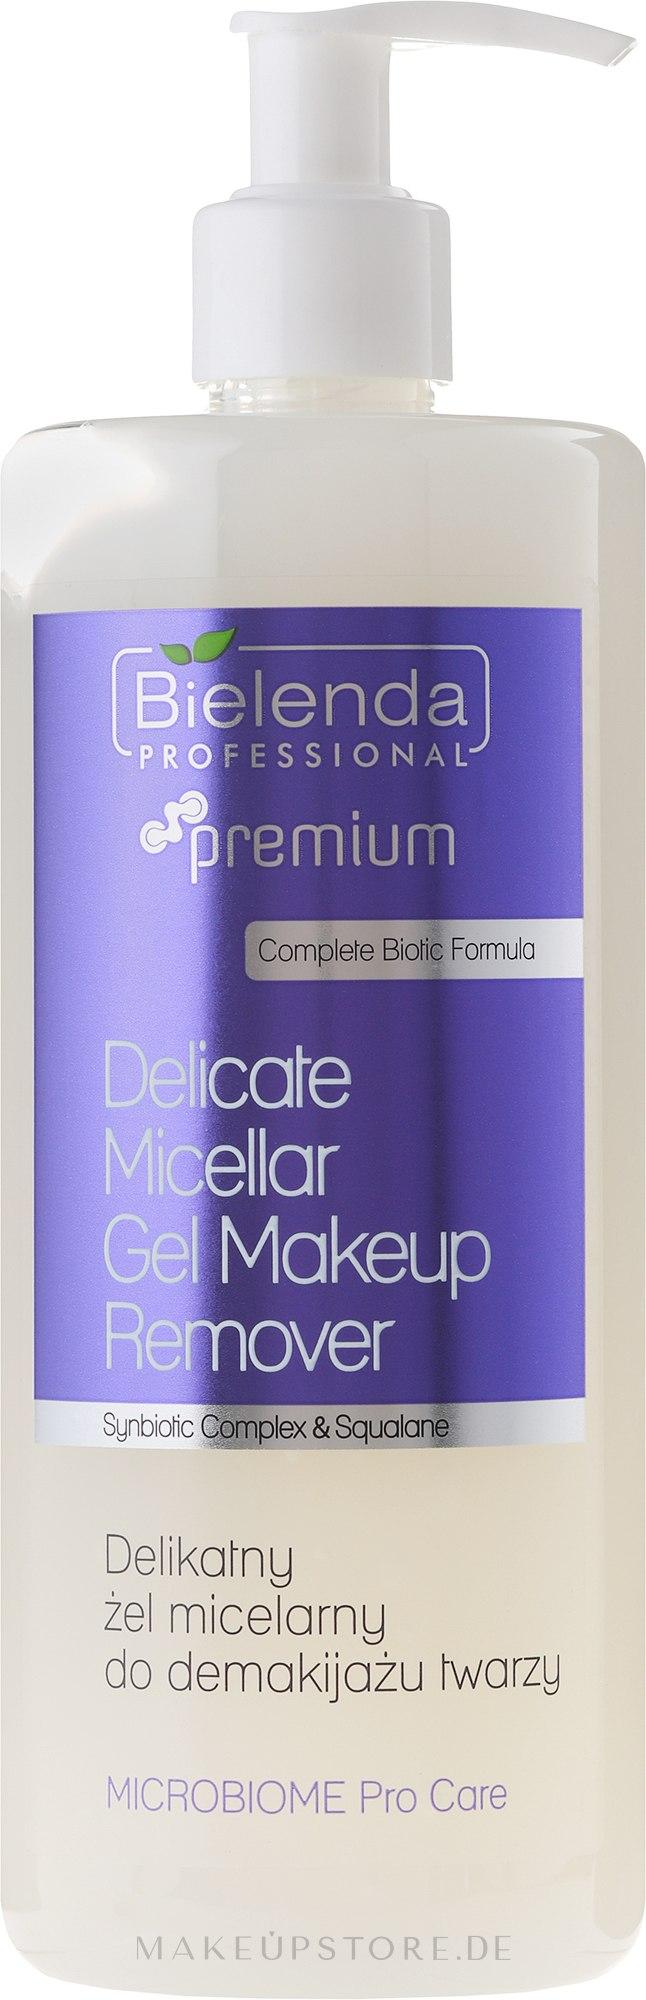 Mizellen-Gesichtswaschgel zum Abschminken - Bielenda Professional Microbiome Pro Care Delicate Micelar Gel Makeup Remover — Bild 500 ml